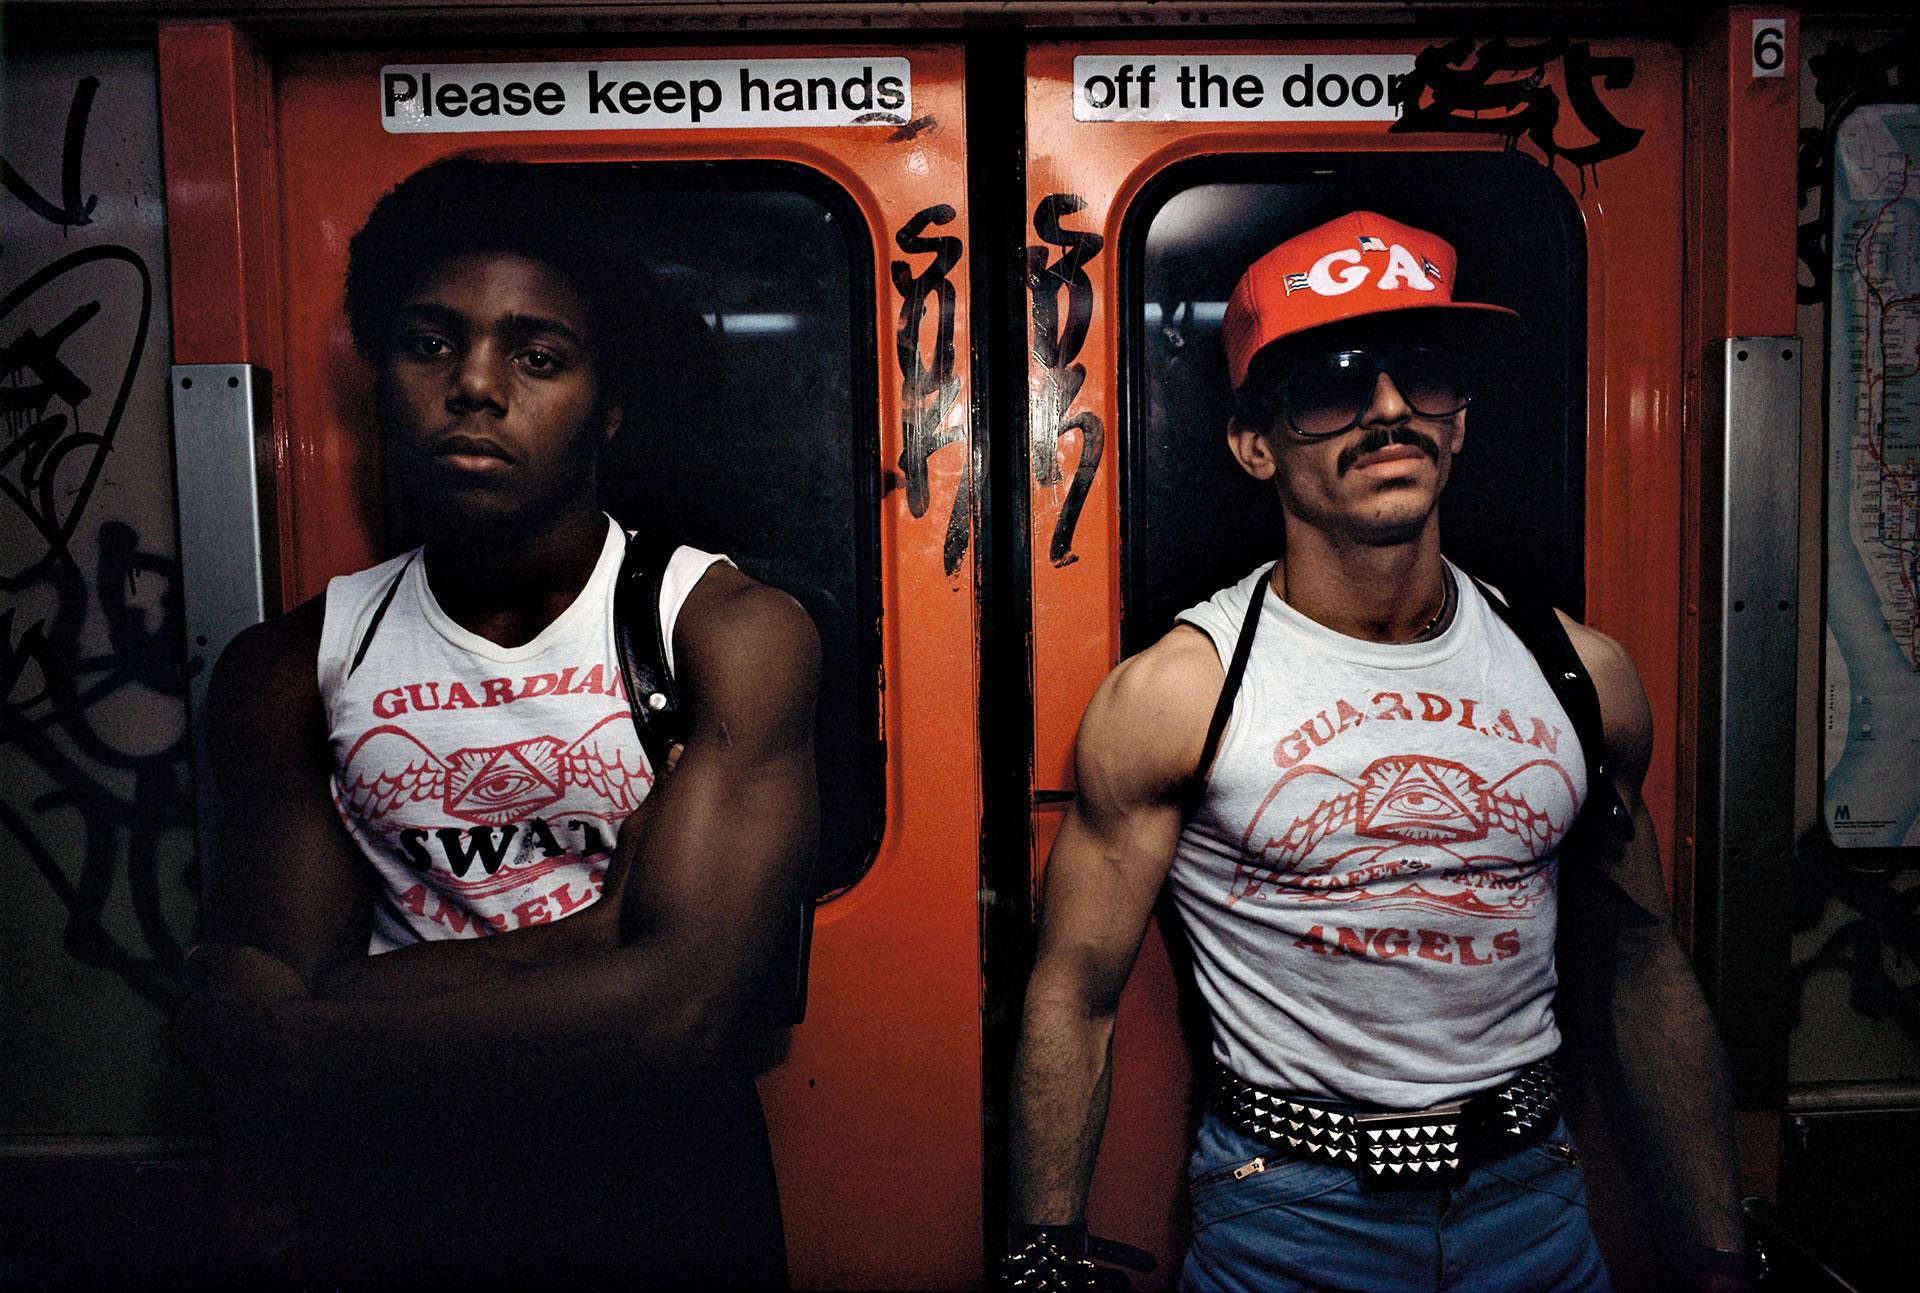 © Bruce Davidson, Subway, New York City, 1980